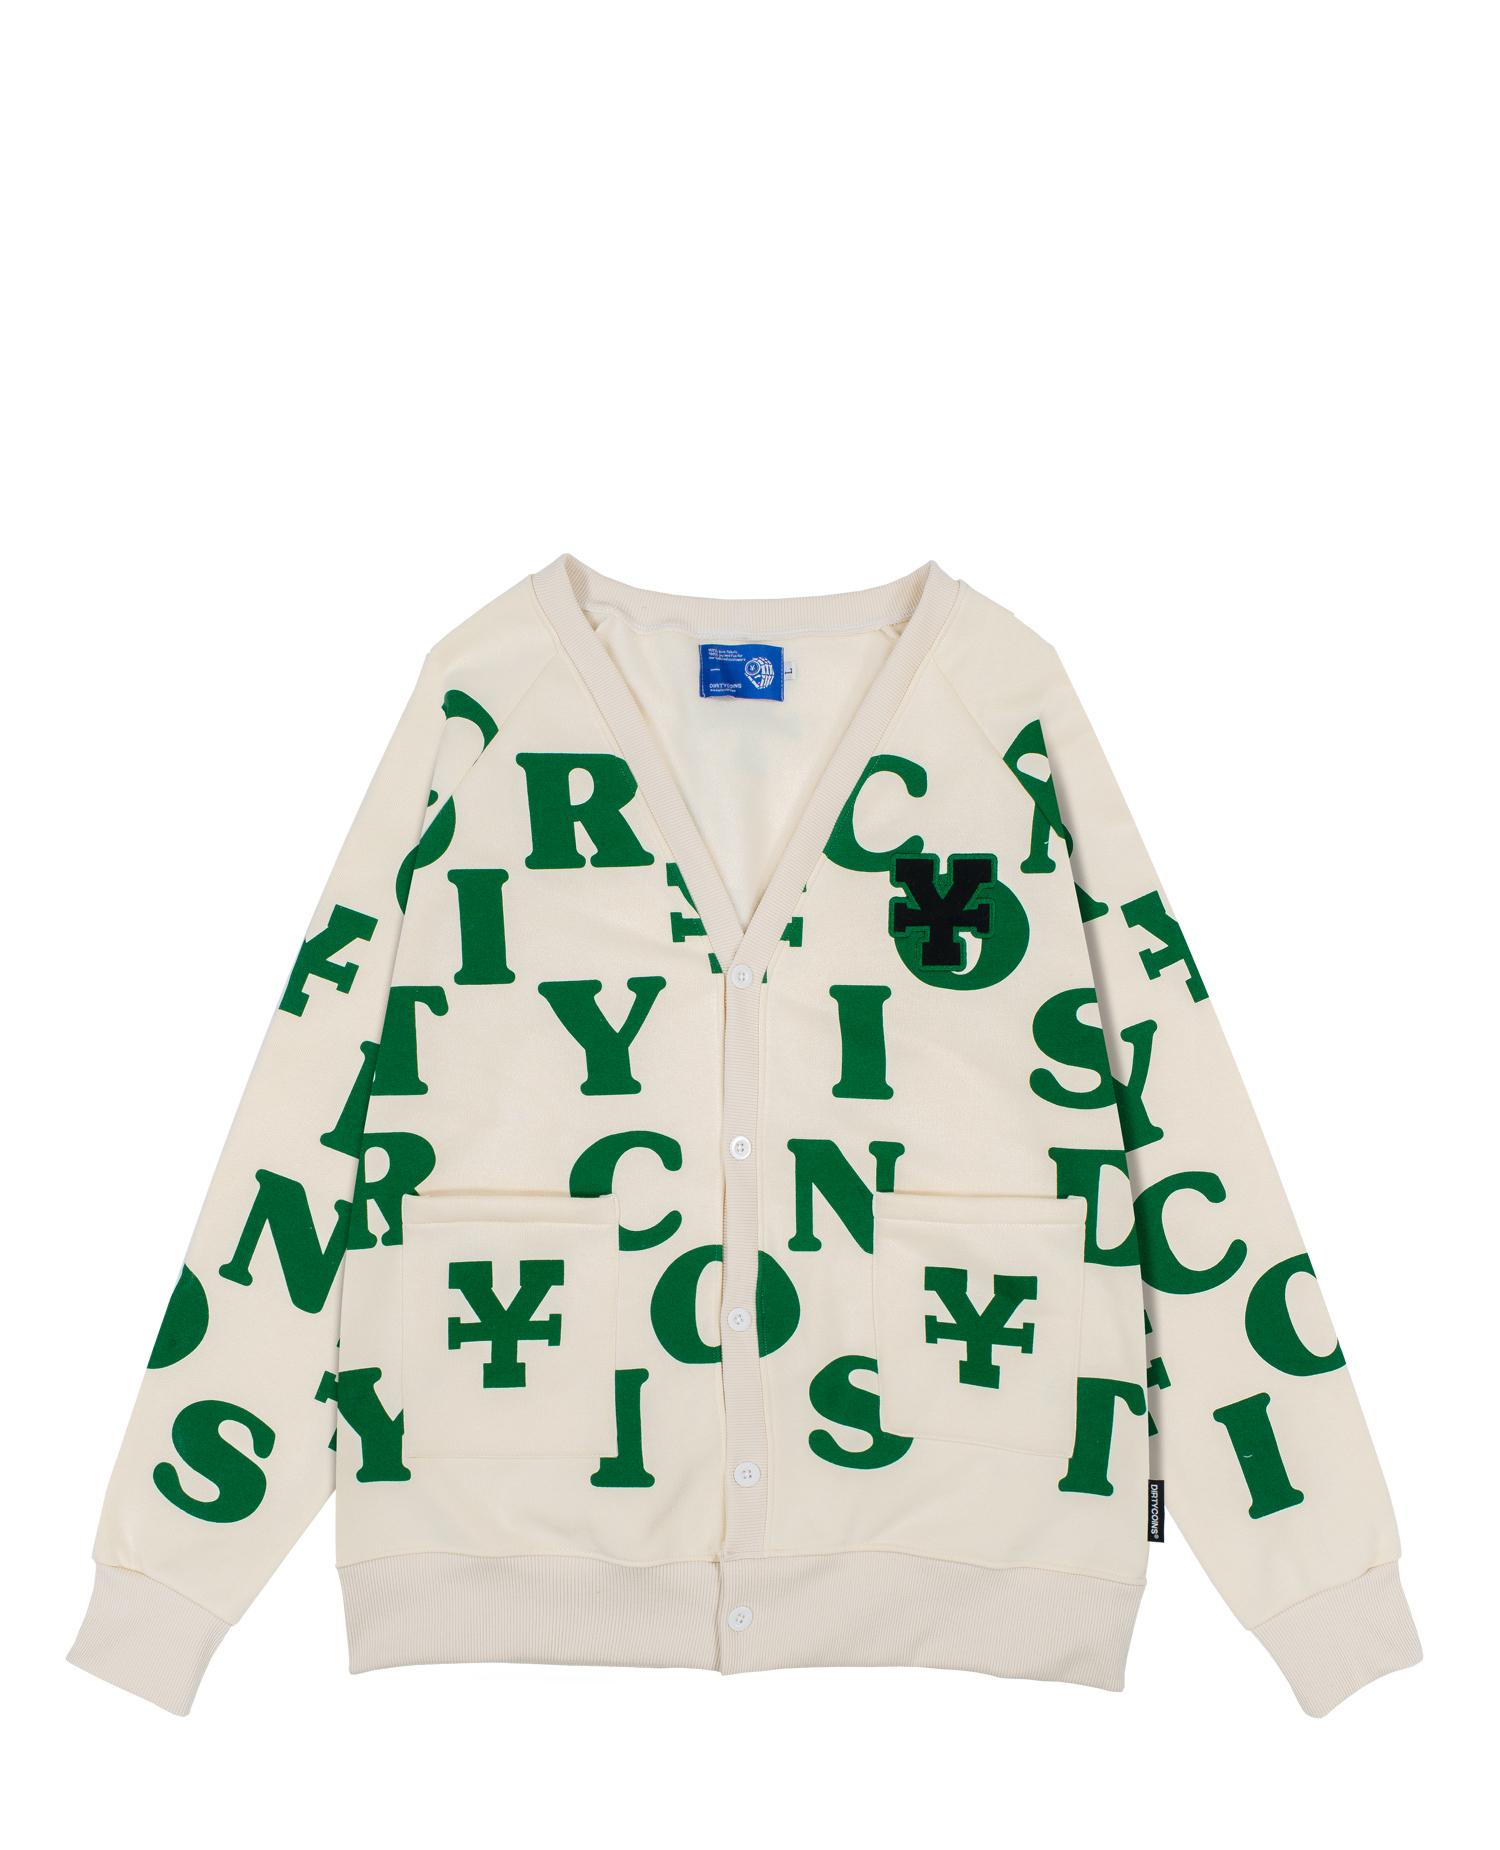 DirtyCoins Print Cardigan - Cream/Green